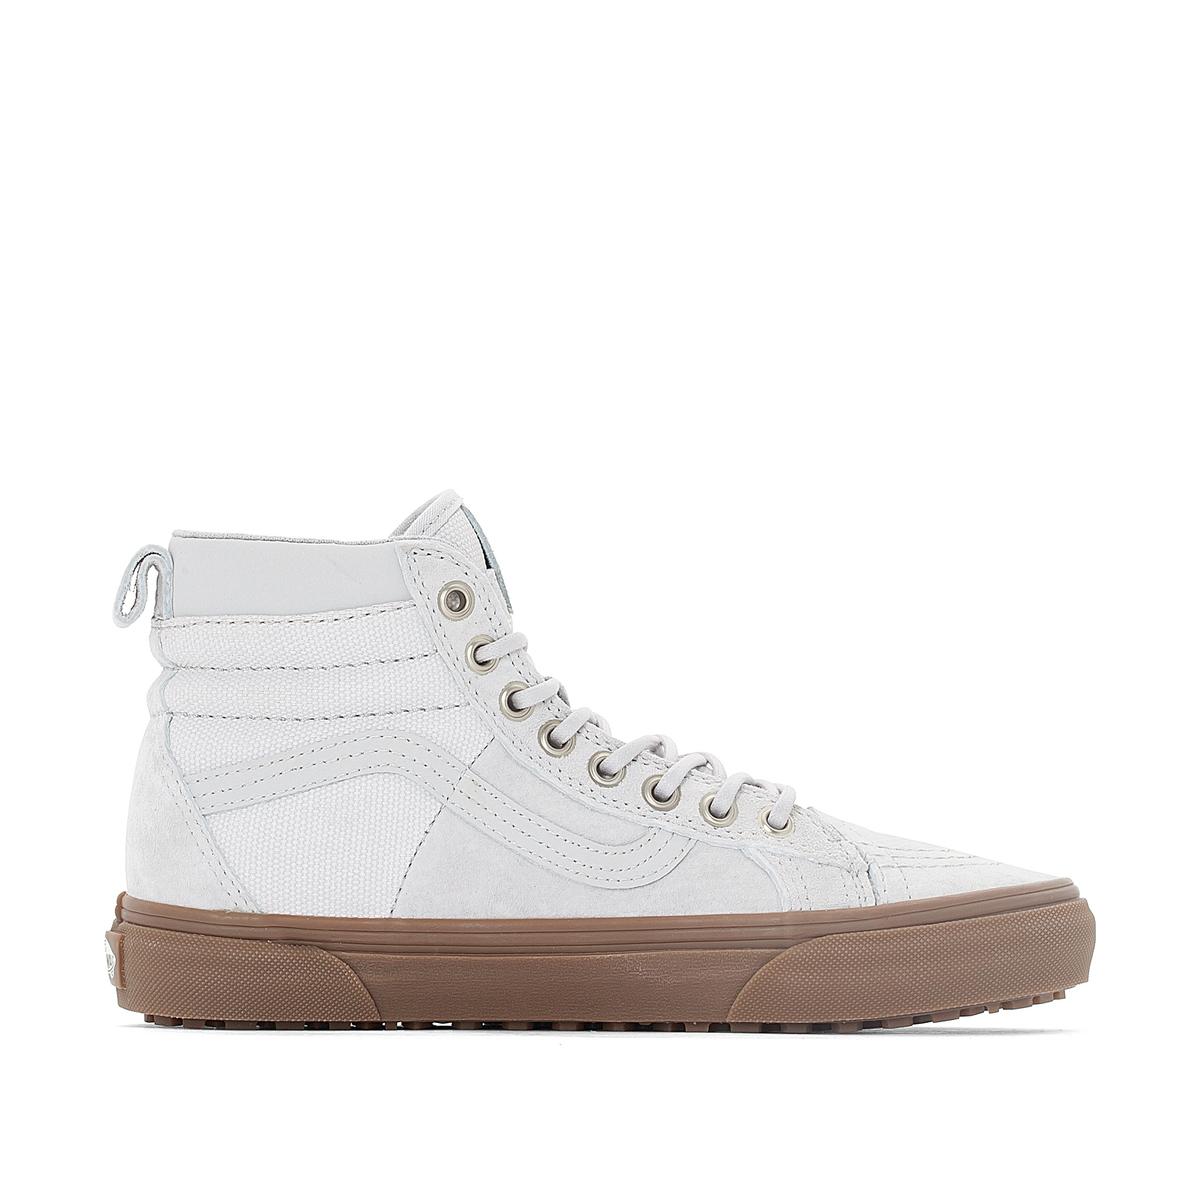 zapatillas Zapatillas de ca?a alta UA SK8 Hi 46 MTE DX